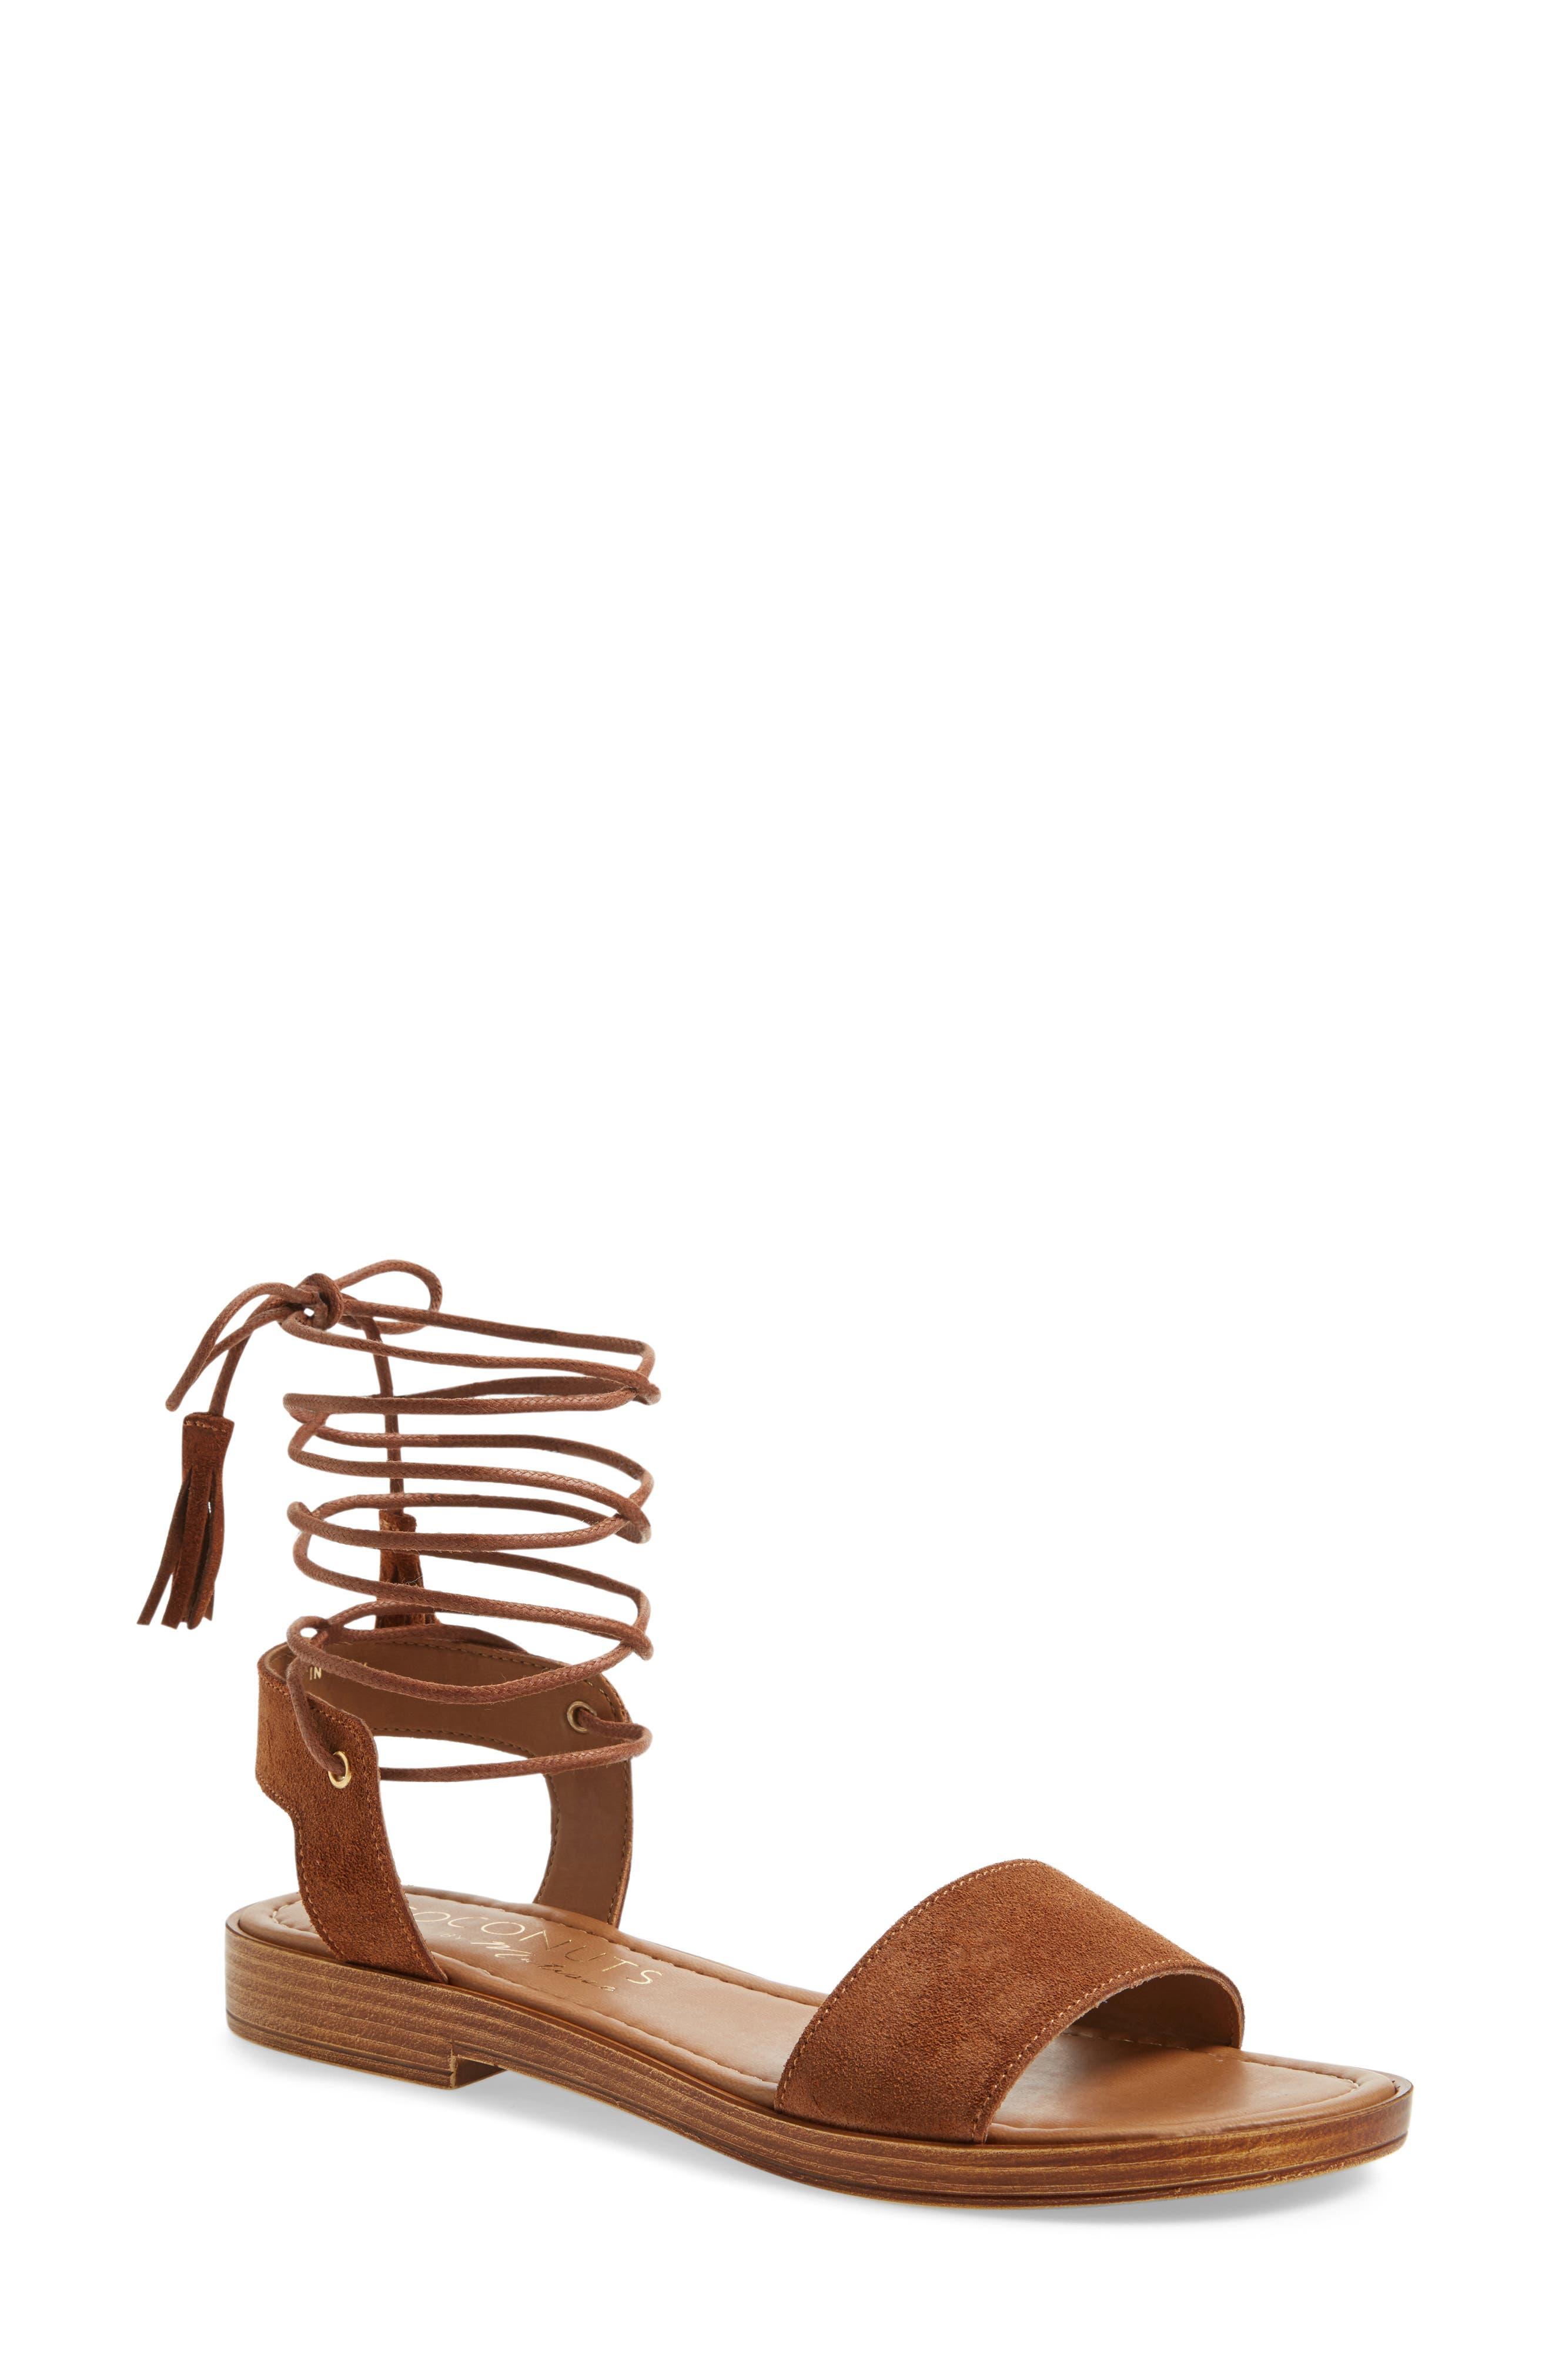 Sting Wraparound Lace Sandal,                         Main,                         color, Saddle Suede